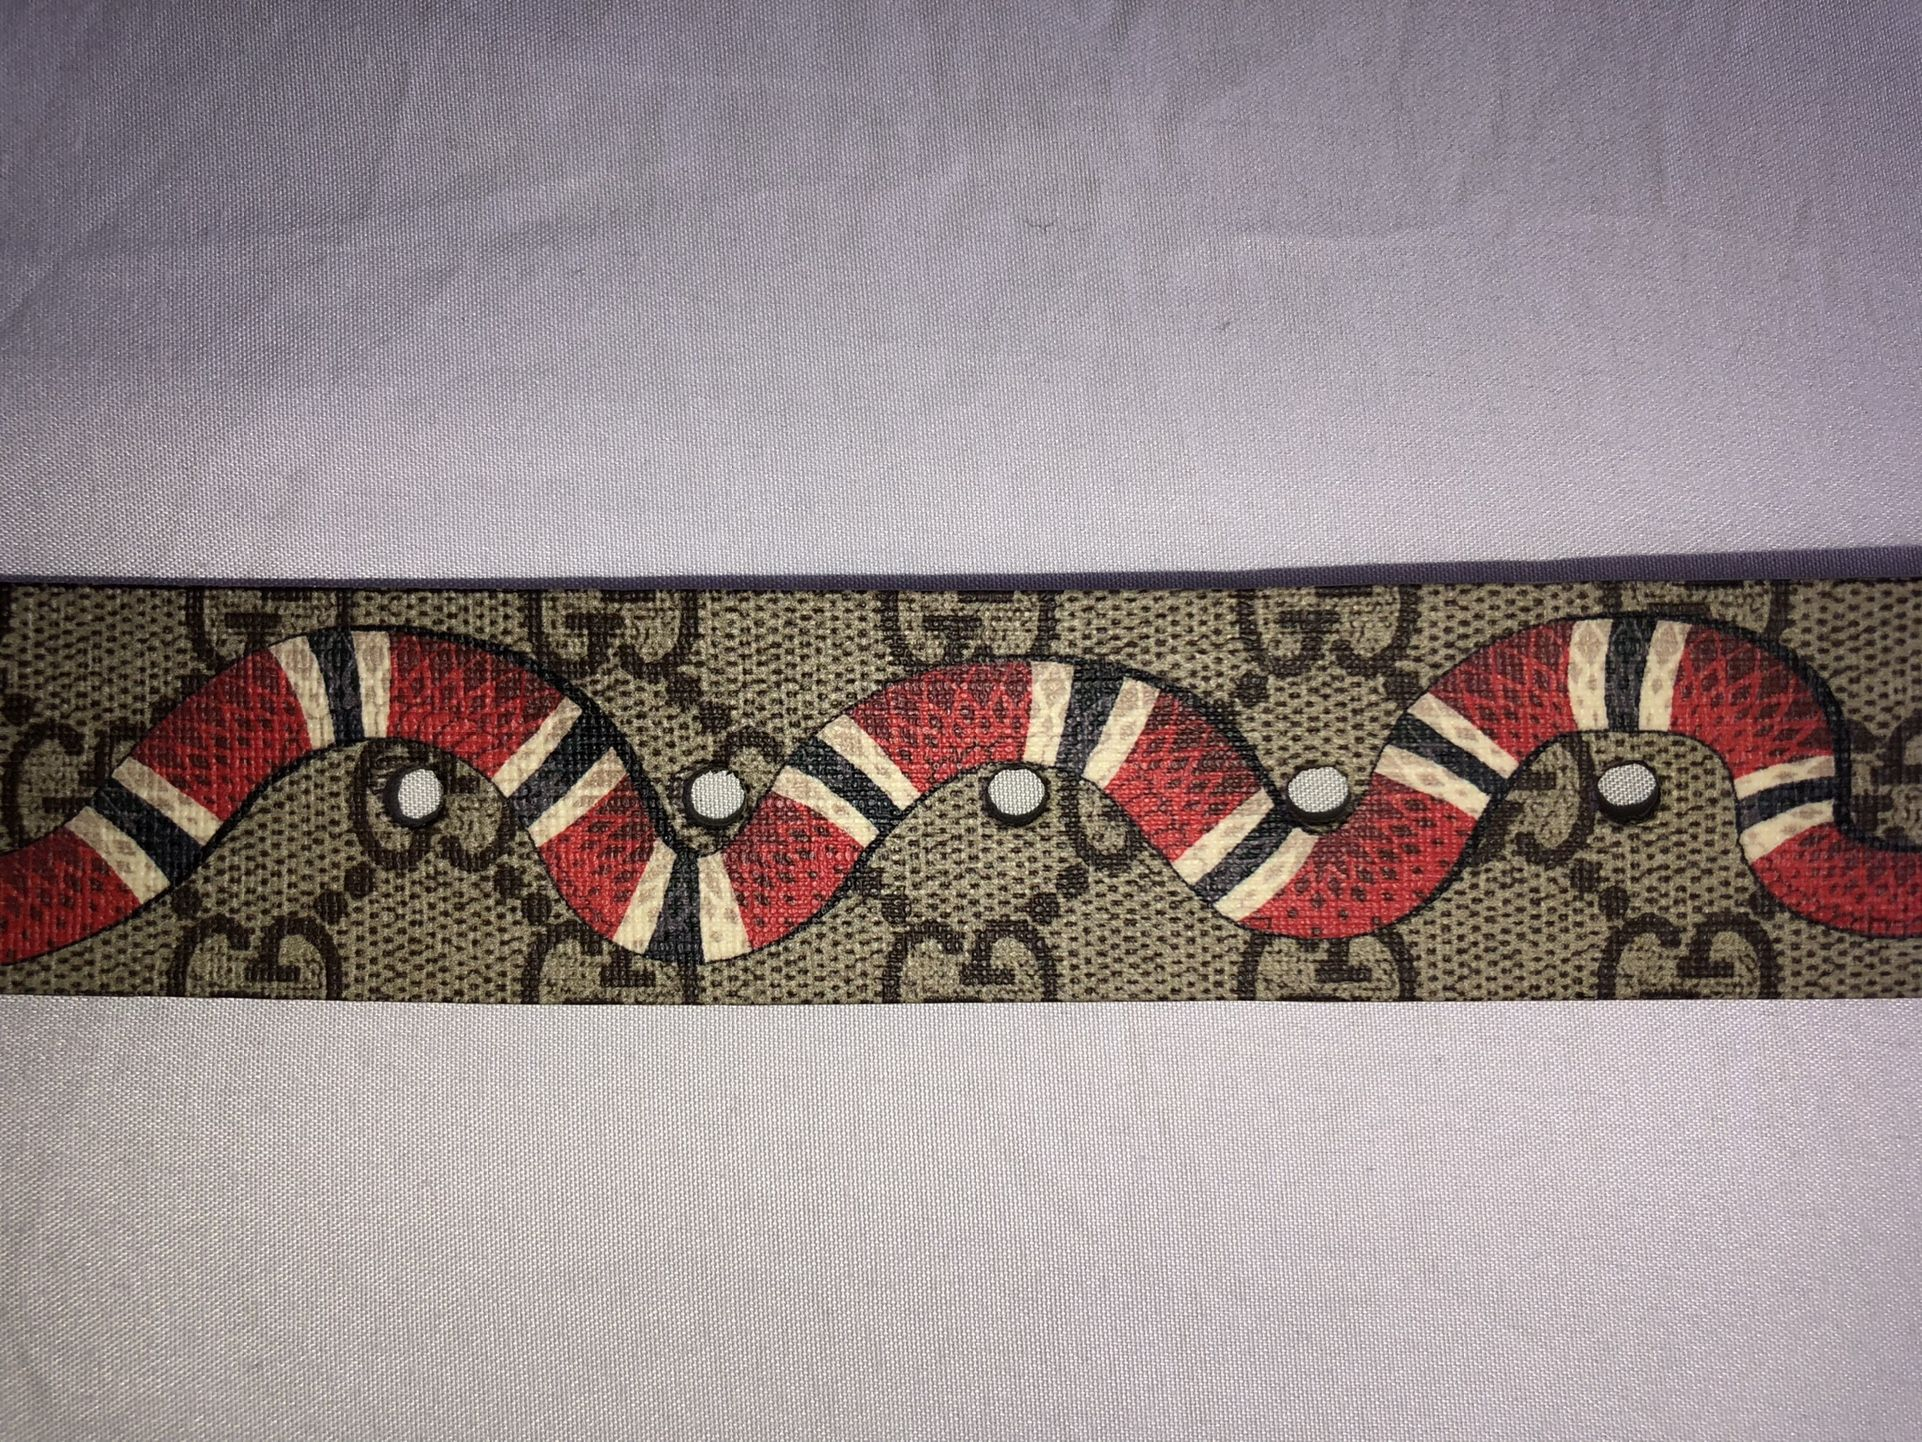 GUCCI Supreme belt with Kingsnake print